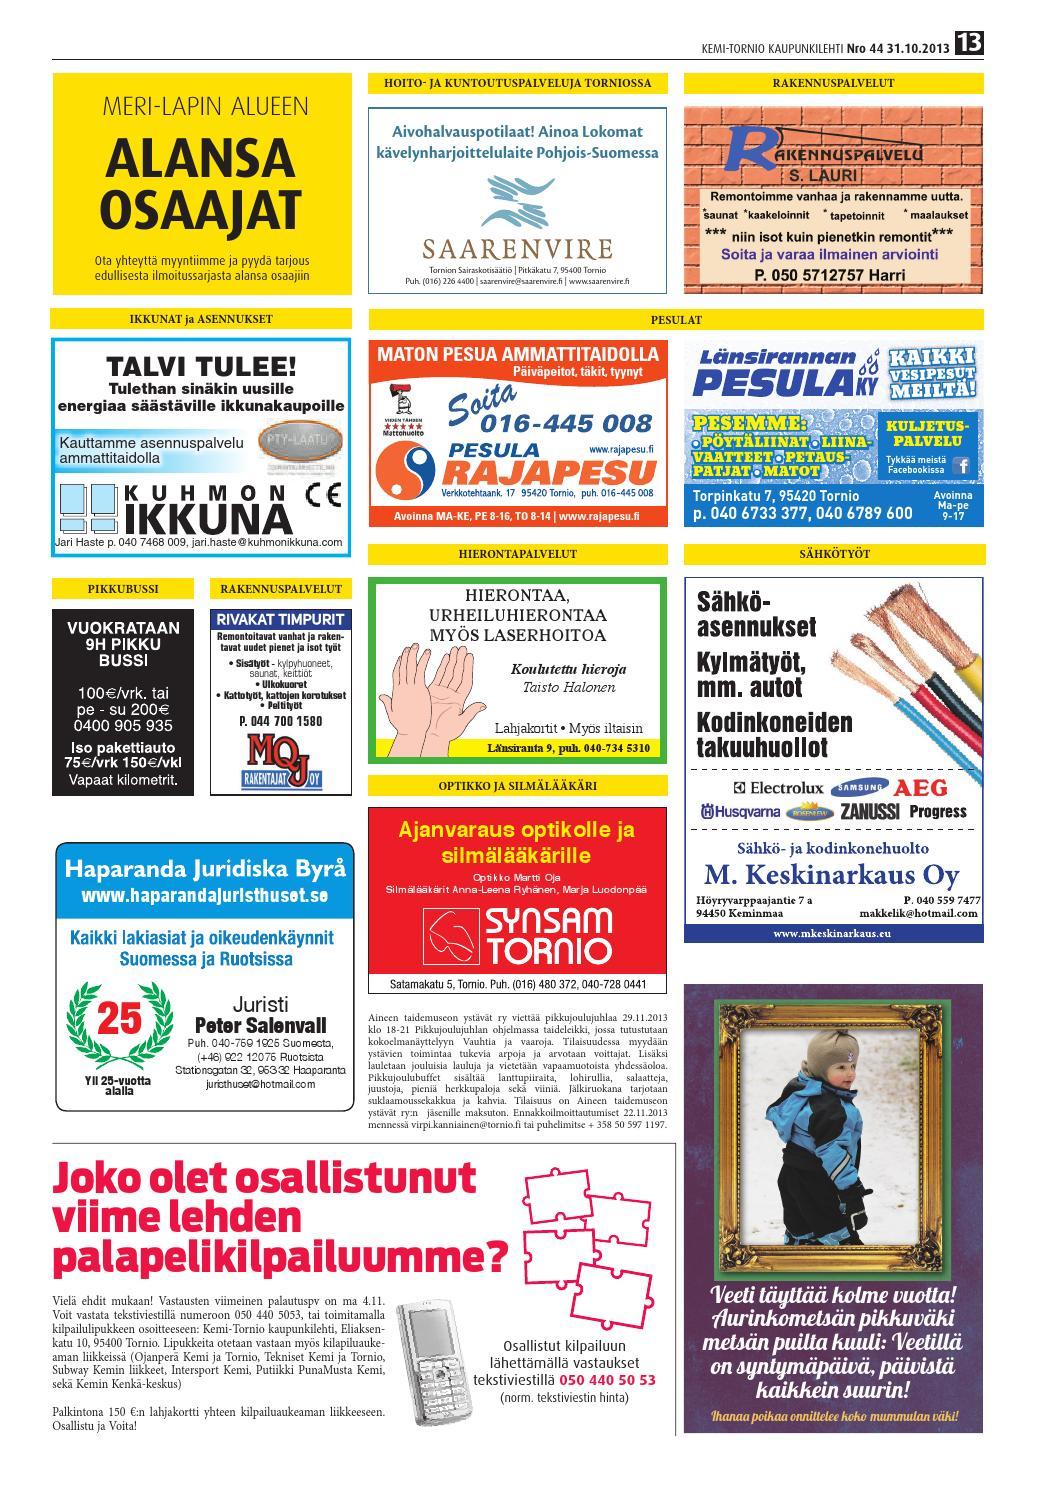 Kemi-Tornio Kaupunkilehti nro 44 2013 by Crea - issuu 0c1f503fbf